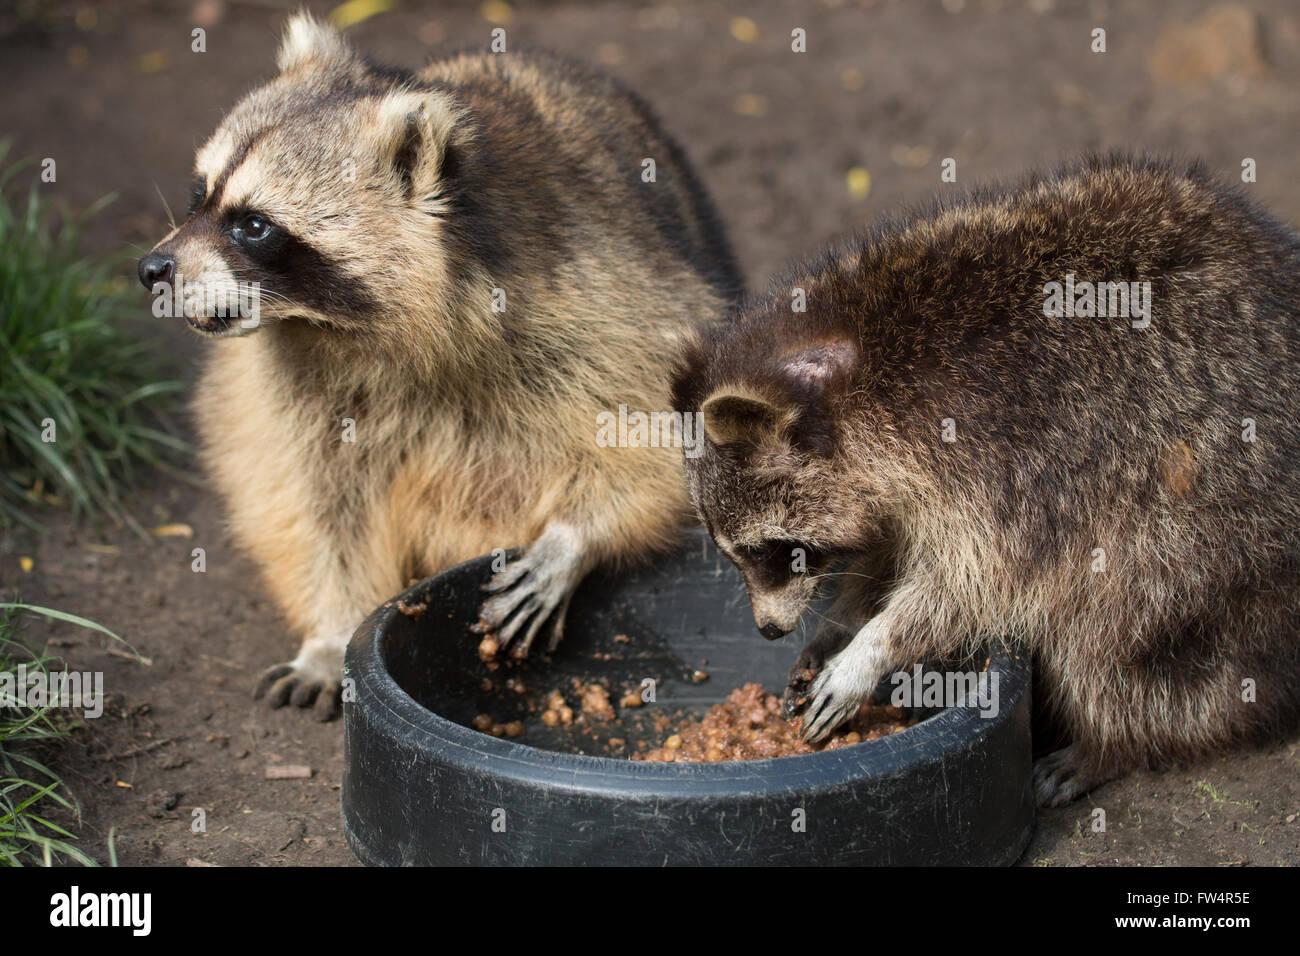 Raccoon Eating Stock Photos Images